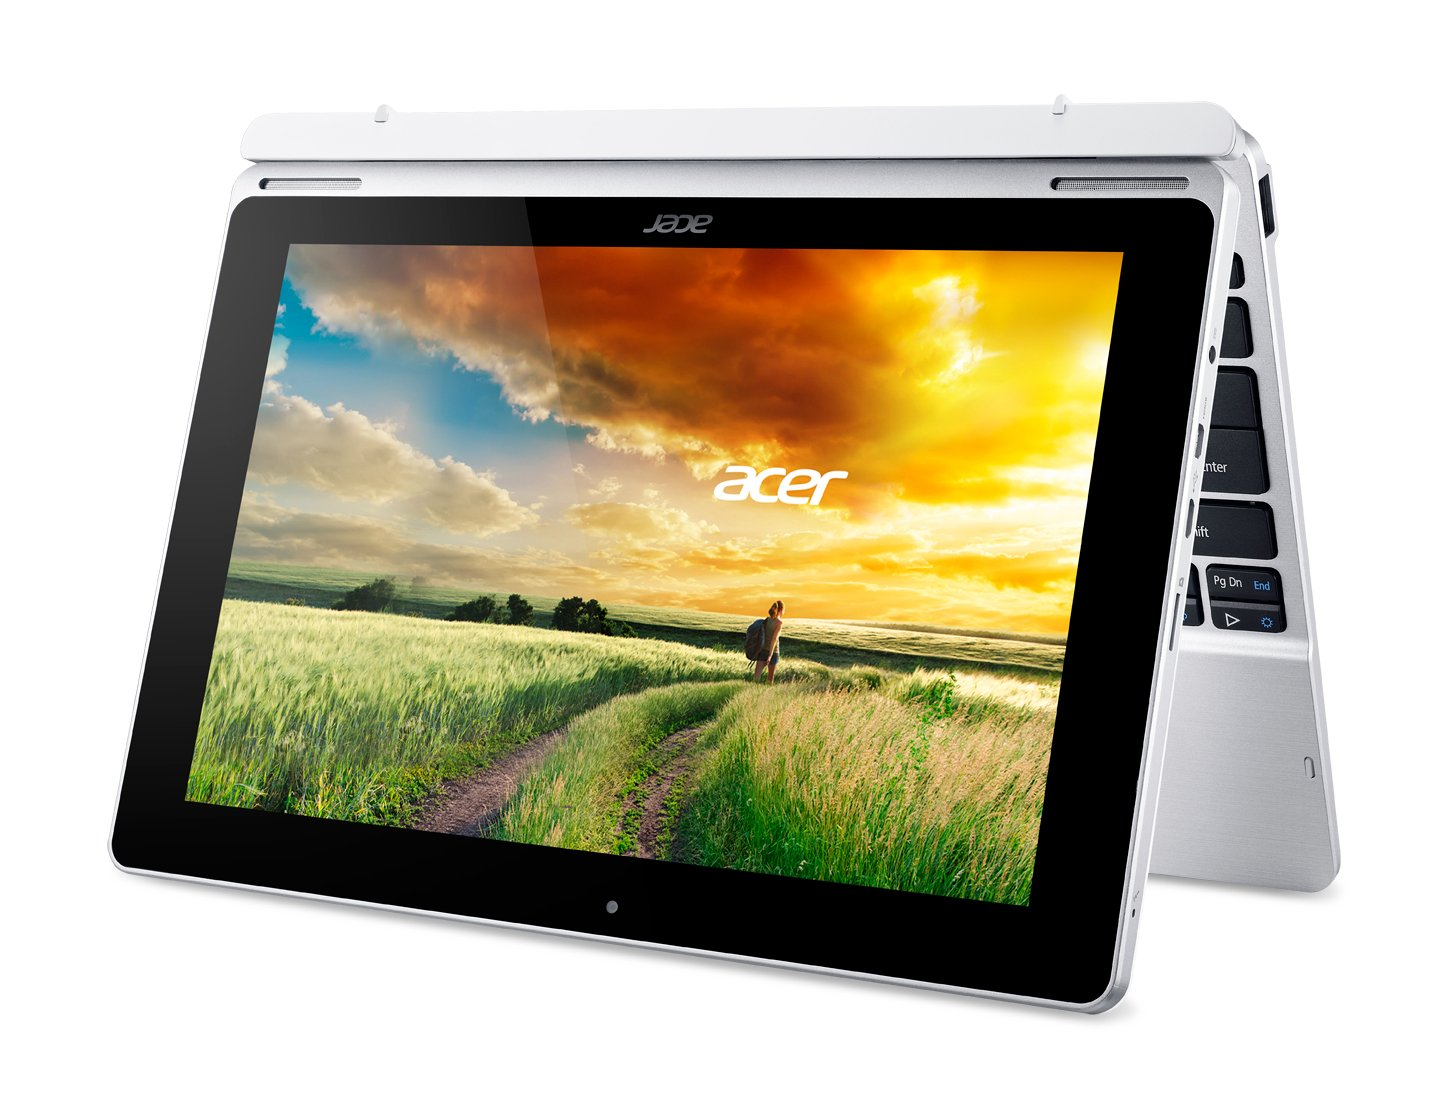 Acer Aspire Switch 10 Desmontable 2 en 1 Pantalla táctil portátil: Amazon.es: Informática